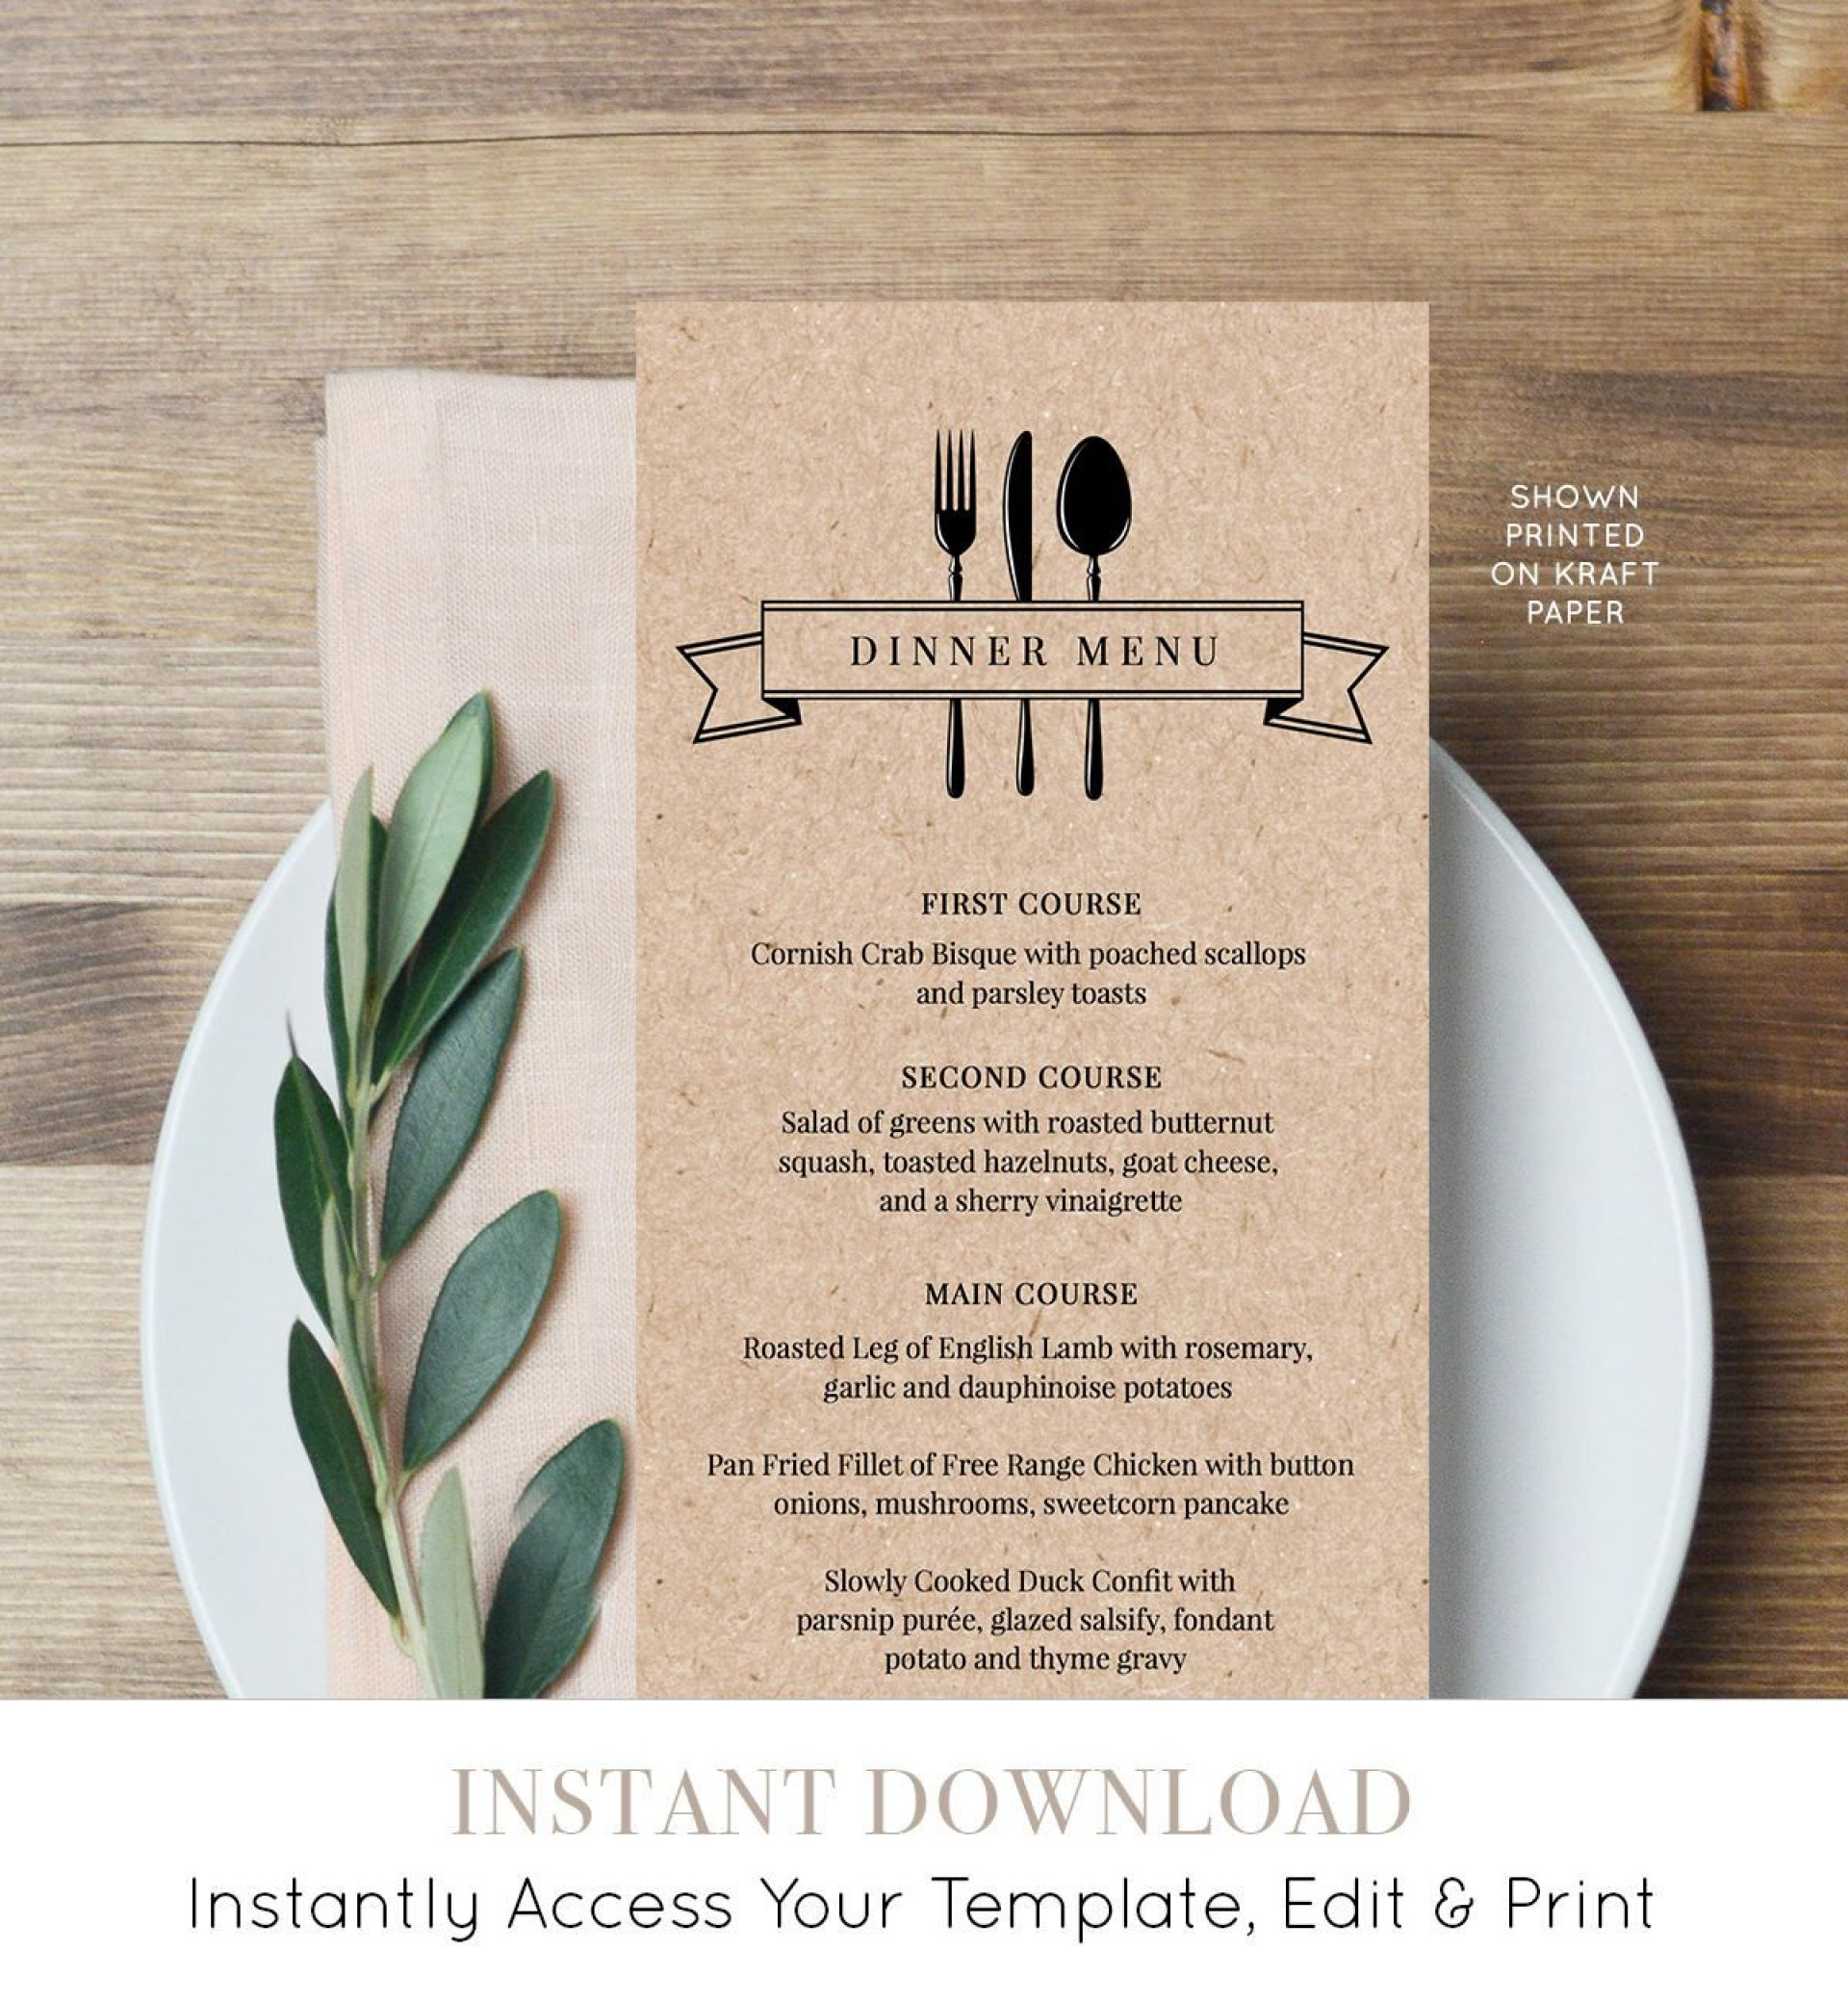 006 Unbelievable Diy Wedding Menu Template High Resolution  Free Card1920